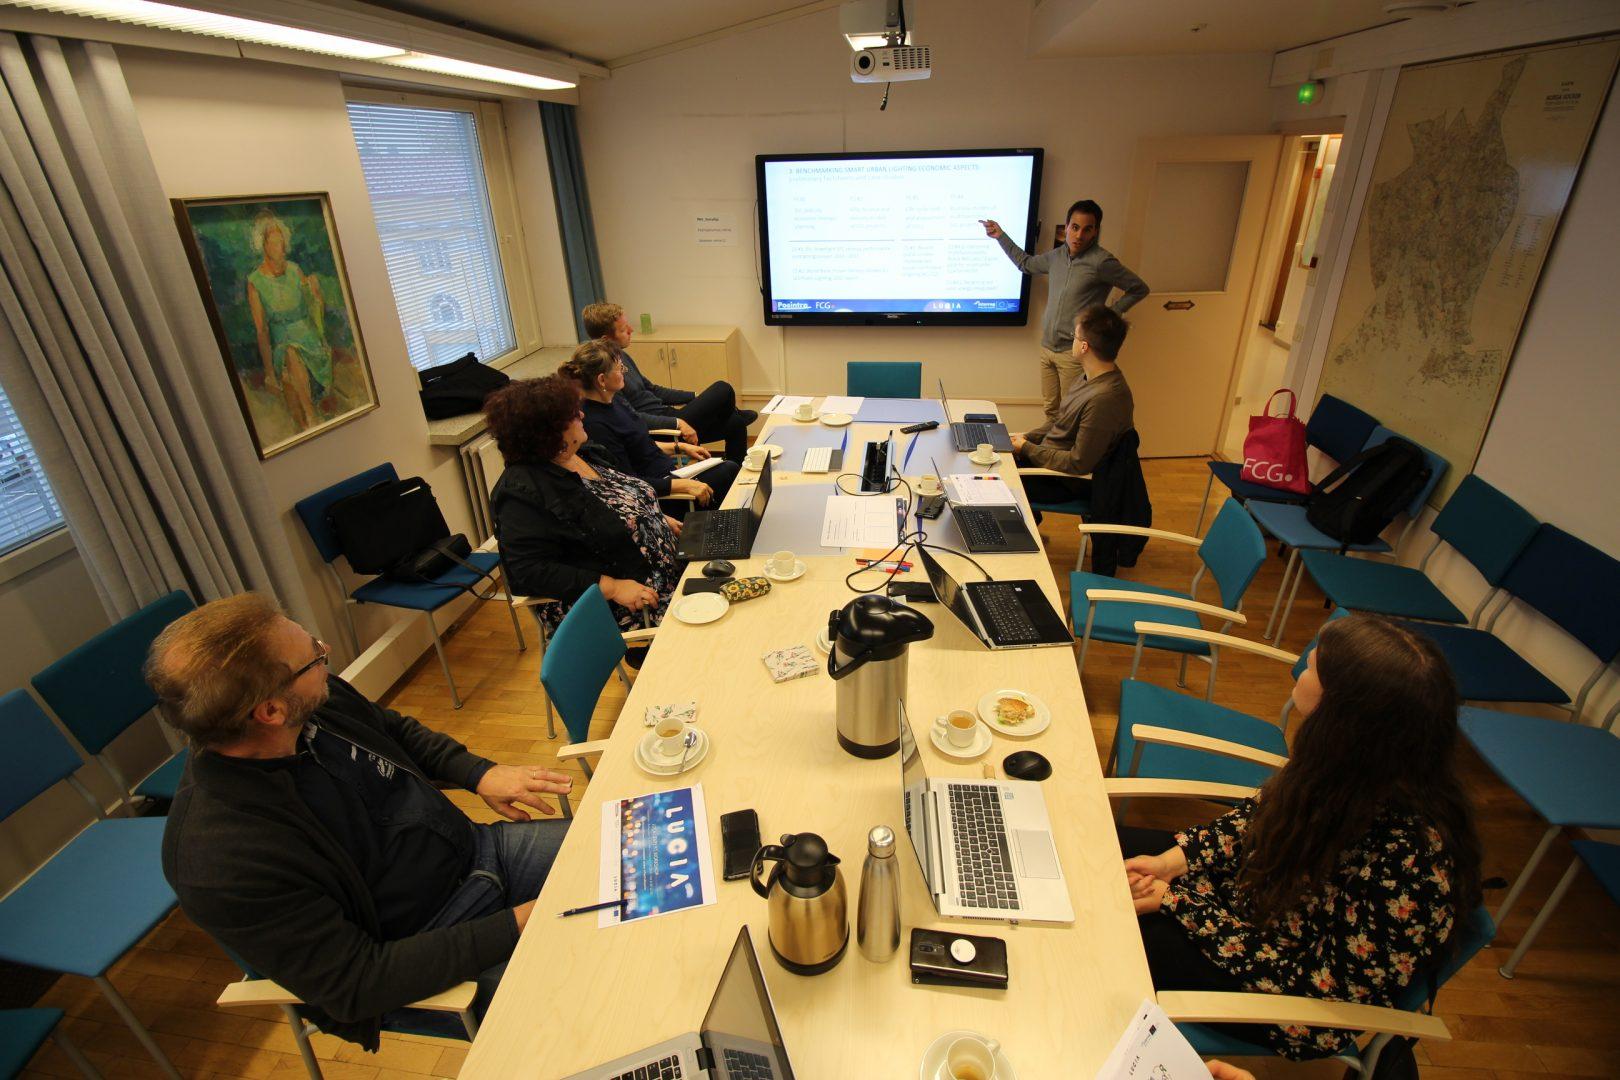 LUCIA local economic expert workshop in Porvoo, Finland on 1 October 2019